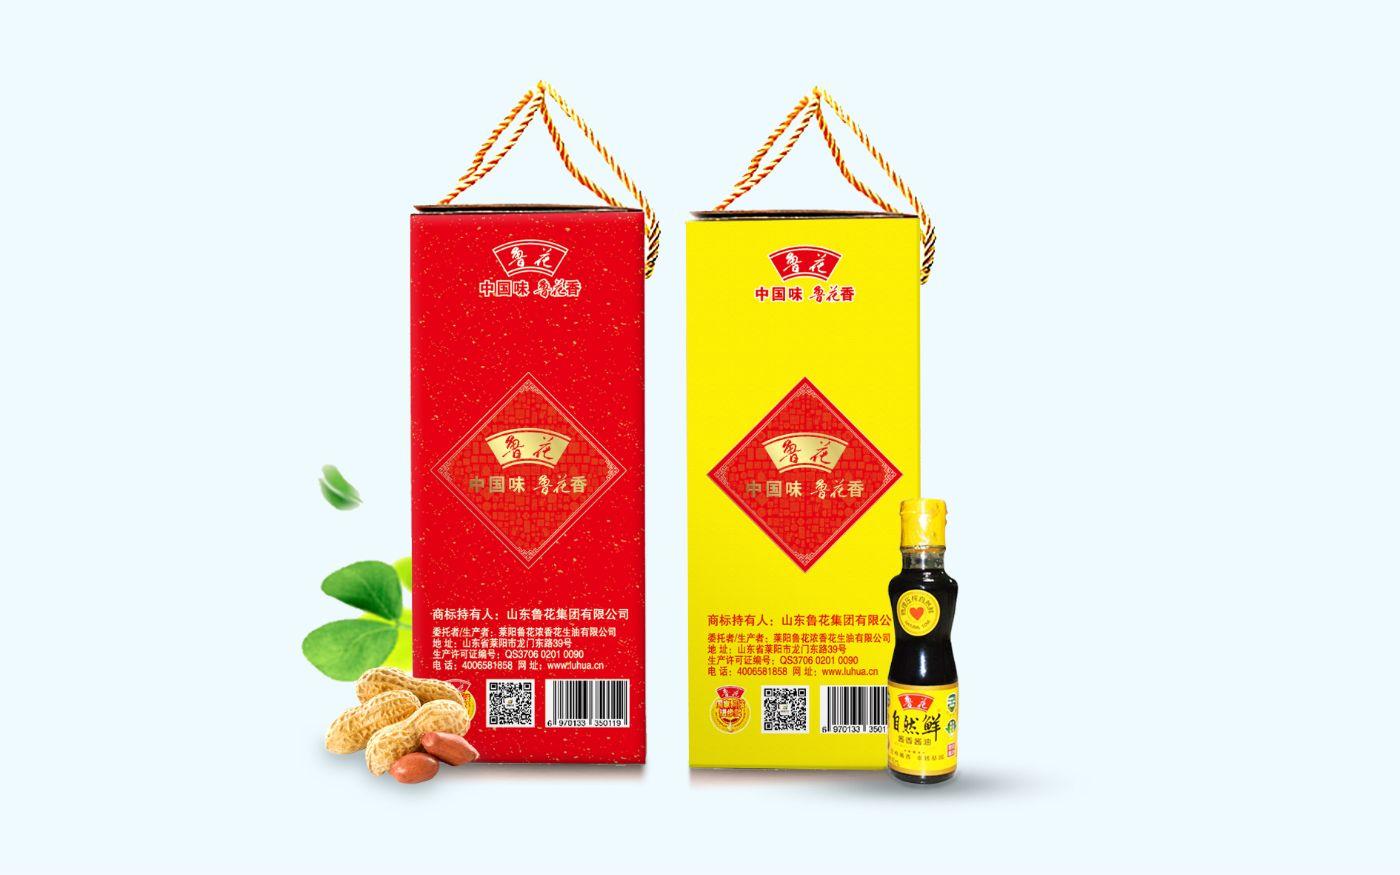 魯花品牌<a href='http://www.6bubu.com/service/baozhuangsheji/' title='' style='color:;font-weight:bold'>包裝設計</a>03.jpg